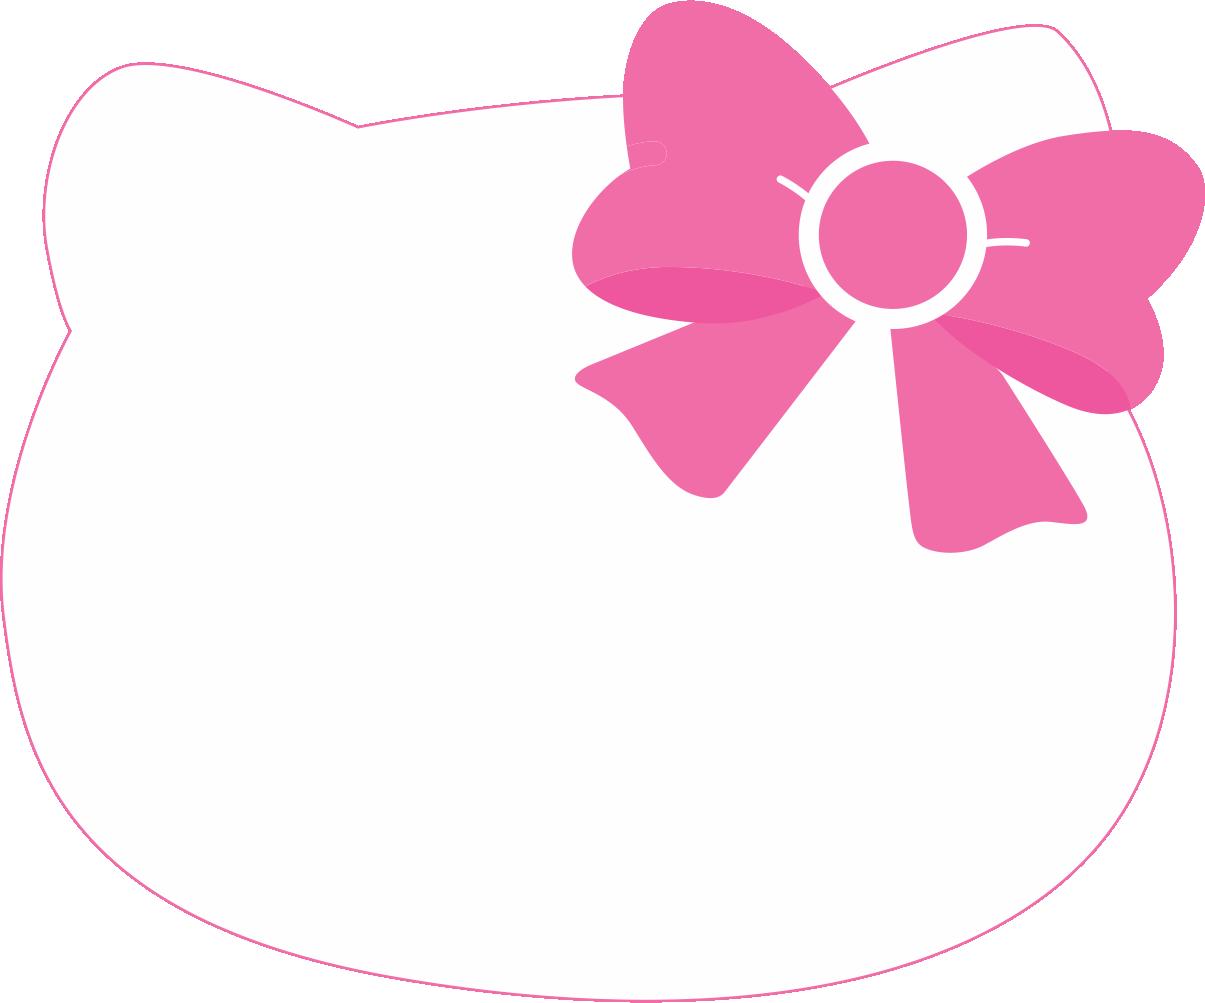 1205x1003 Hello Kitty Free Printable Mini Kit. Oh My Fiesta! In English